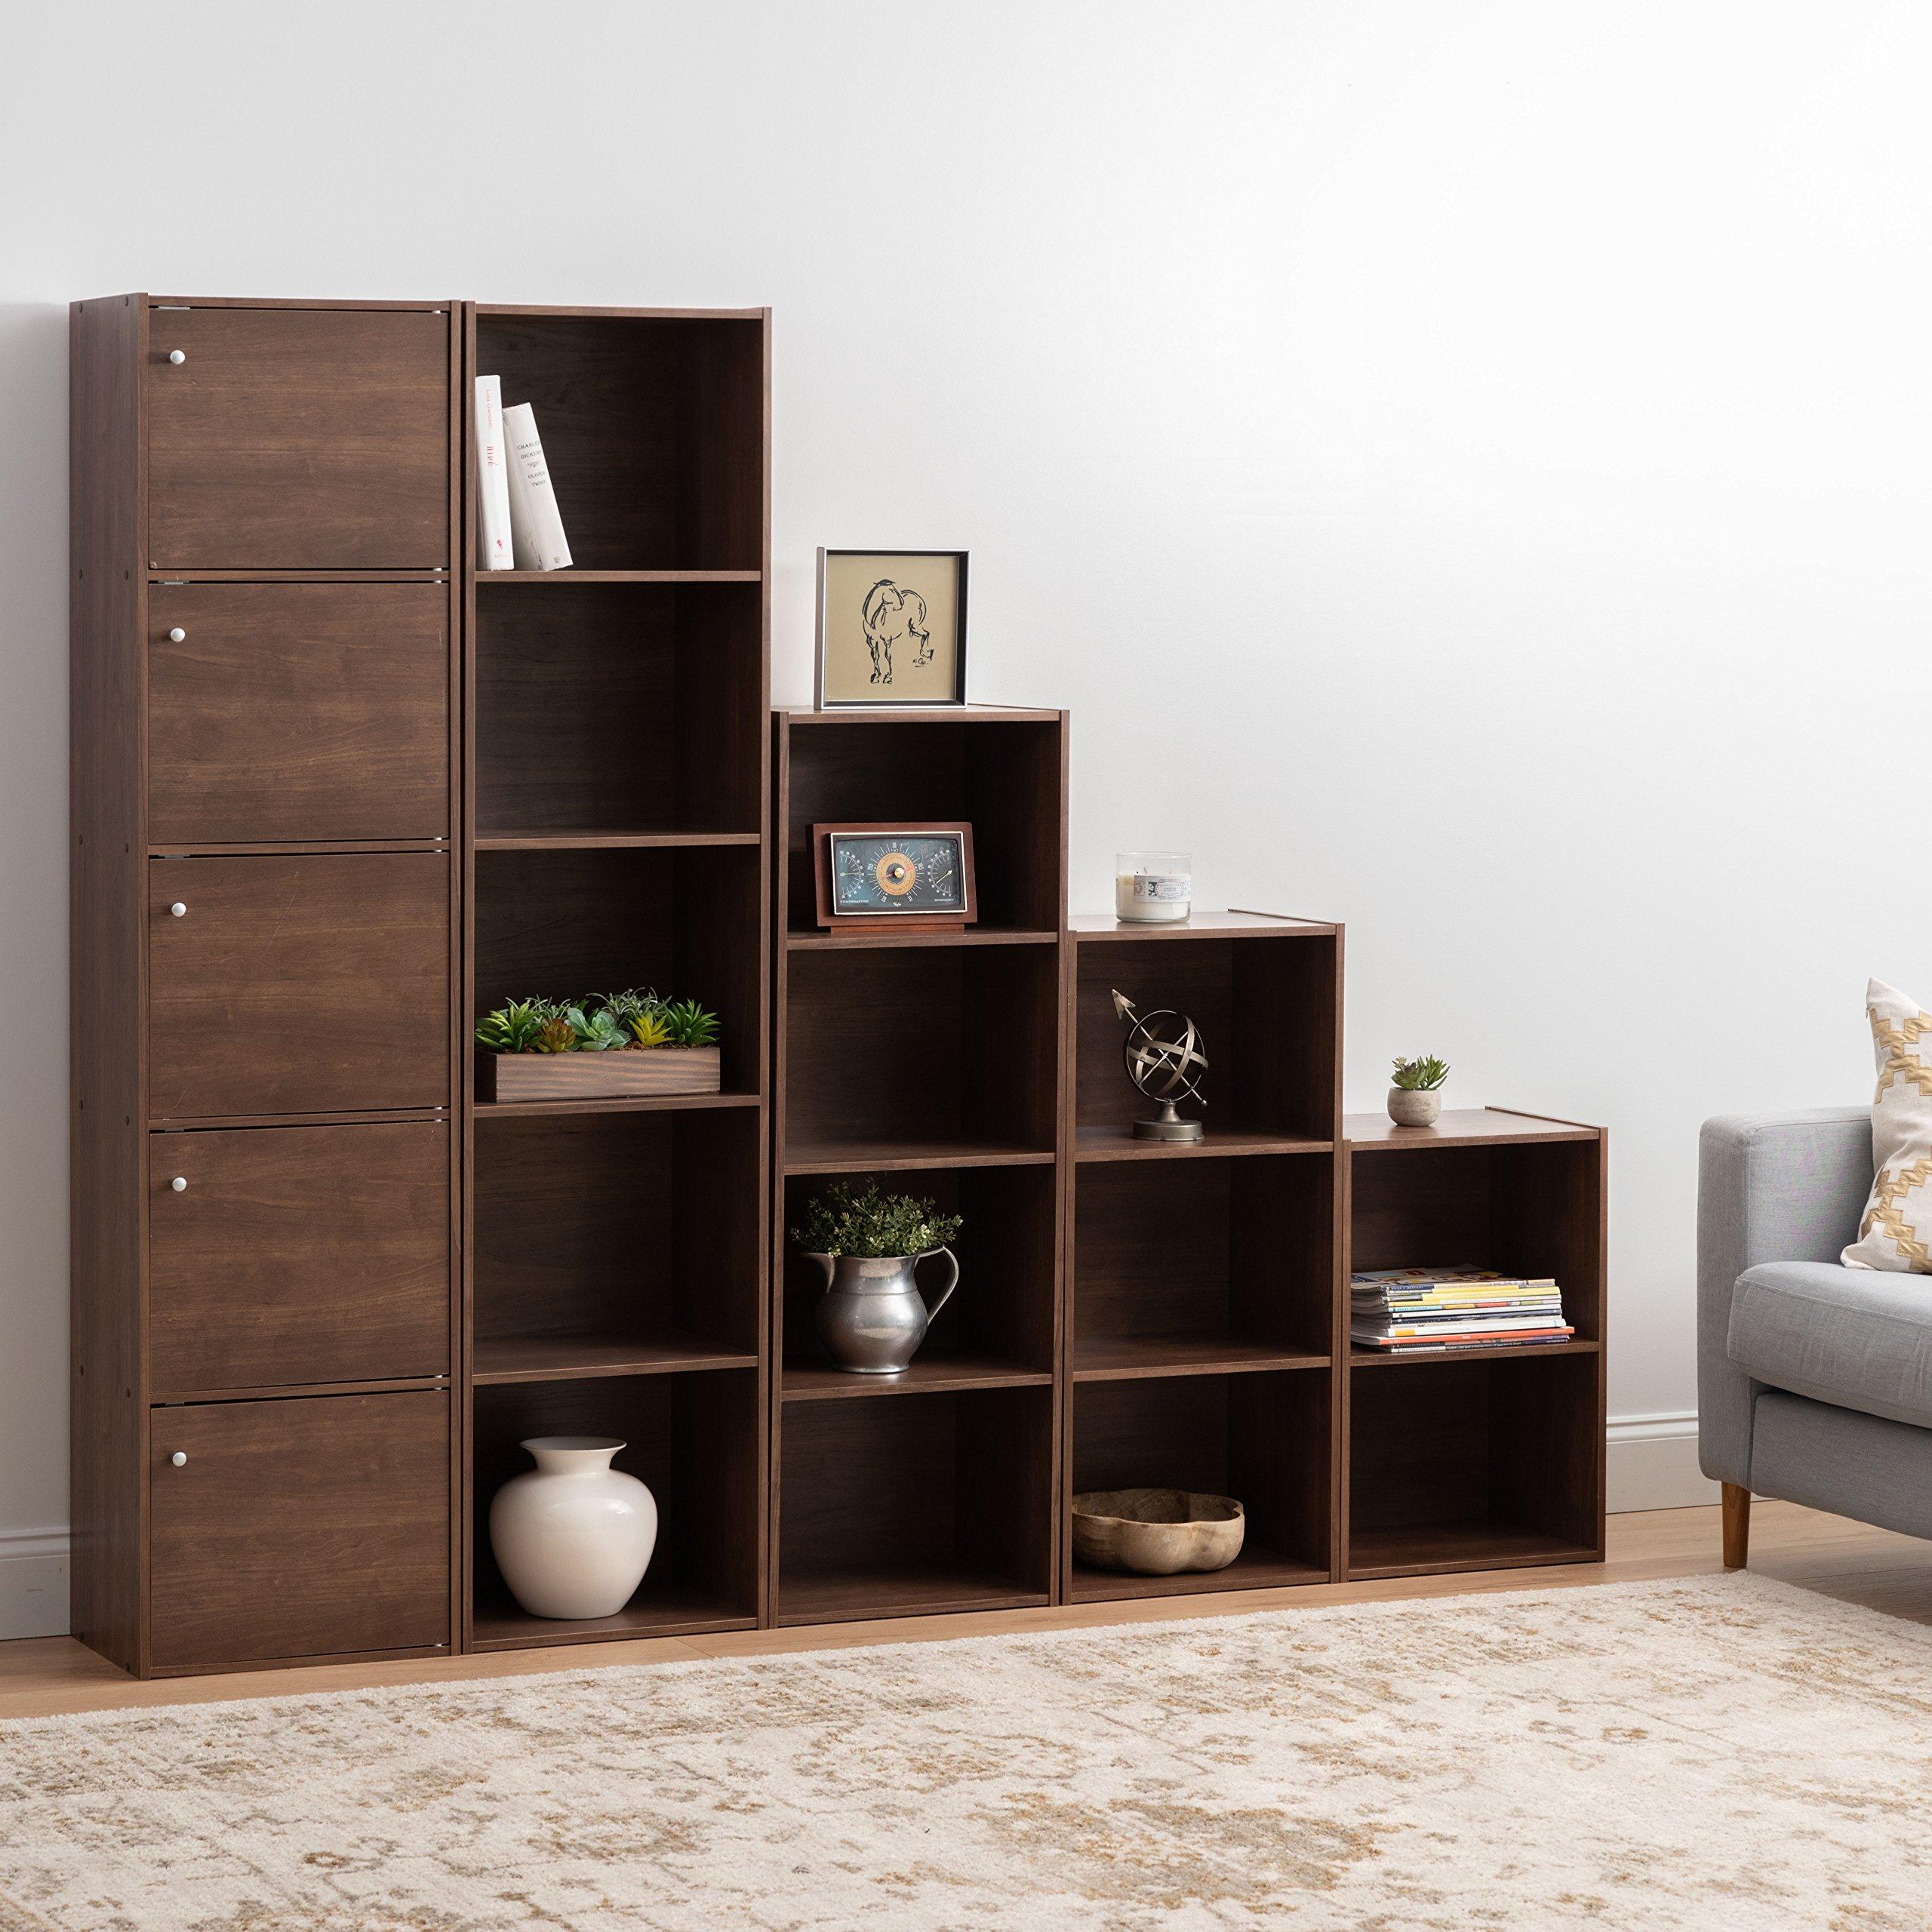 IRIS 3-Tier Basic Wood Bookcase Storage Shelf, Dark Brown by IRIS USA, Inc. (Image #5)